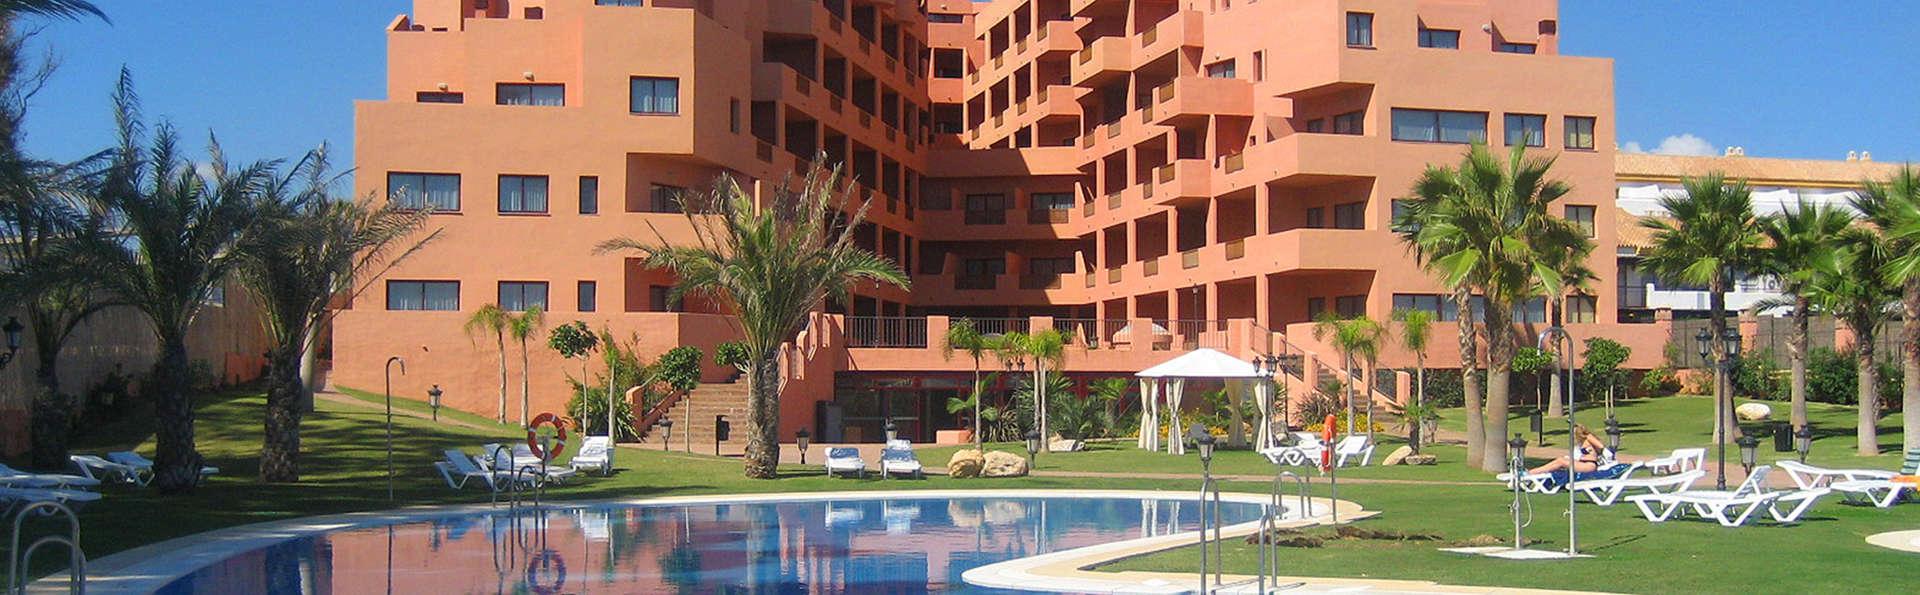 Apartamentos Turísticos Don Juan - EDIT_Exterior1.jpg